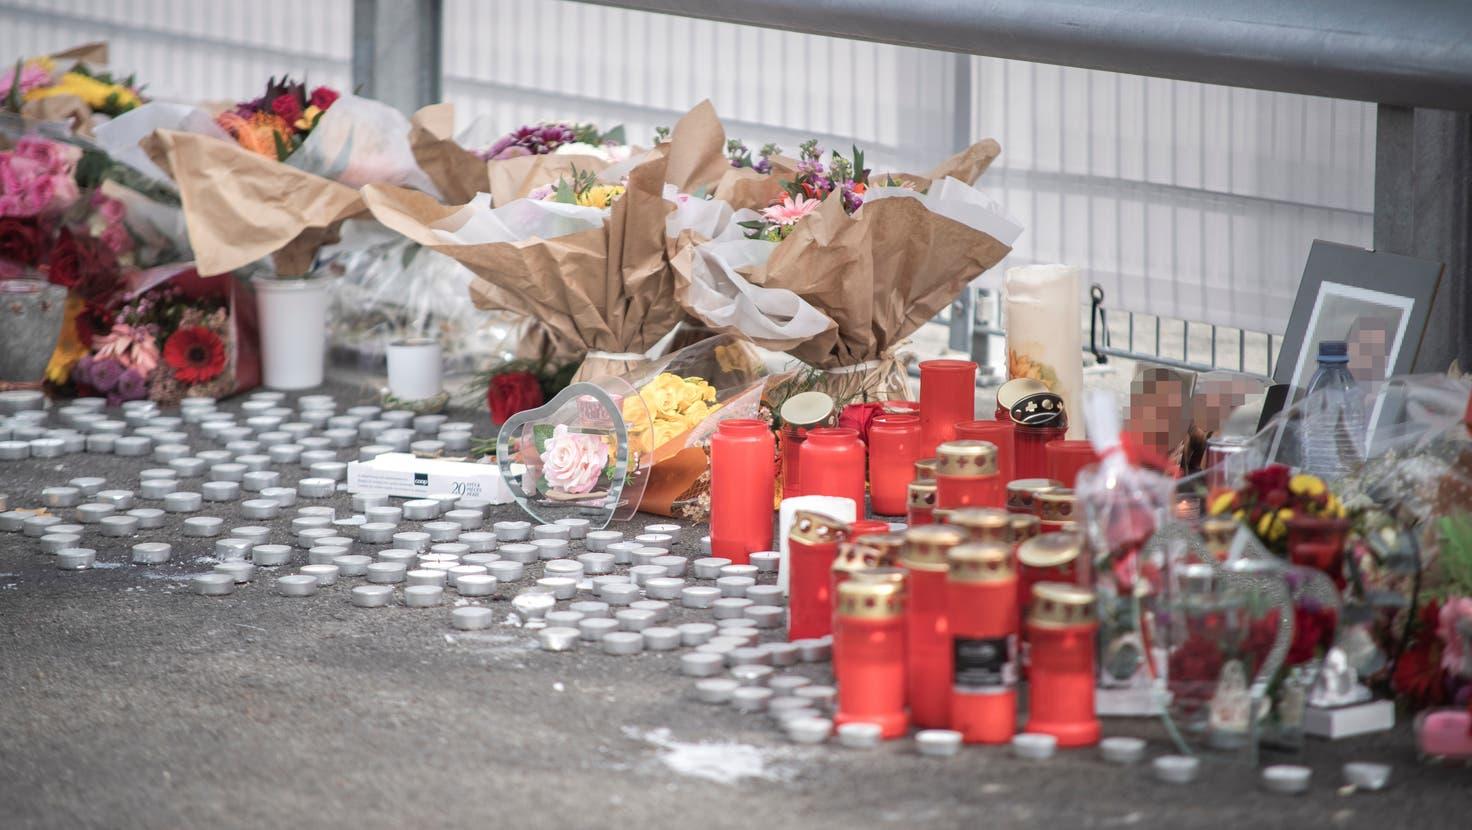 Diese Gedenkstätte am Ort des Geschehens erinnert an das Opfer. (Bild: Pius Amrein (Geuensee, 27. September 2021))